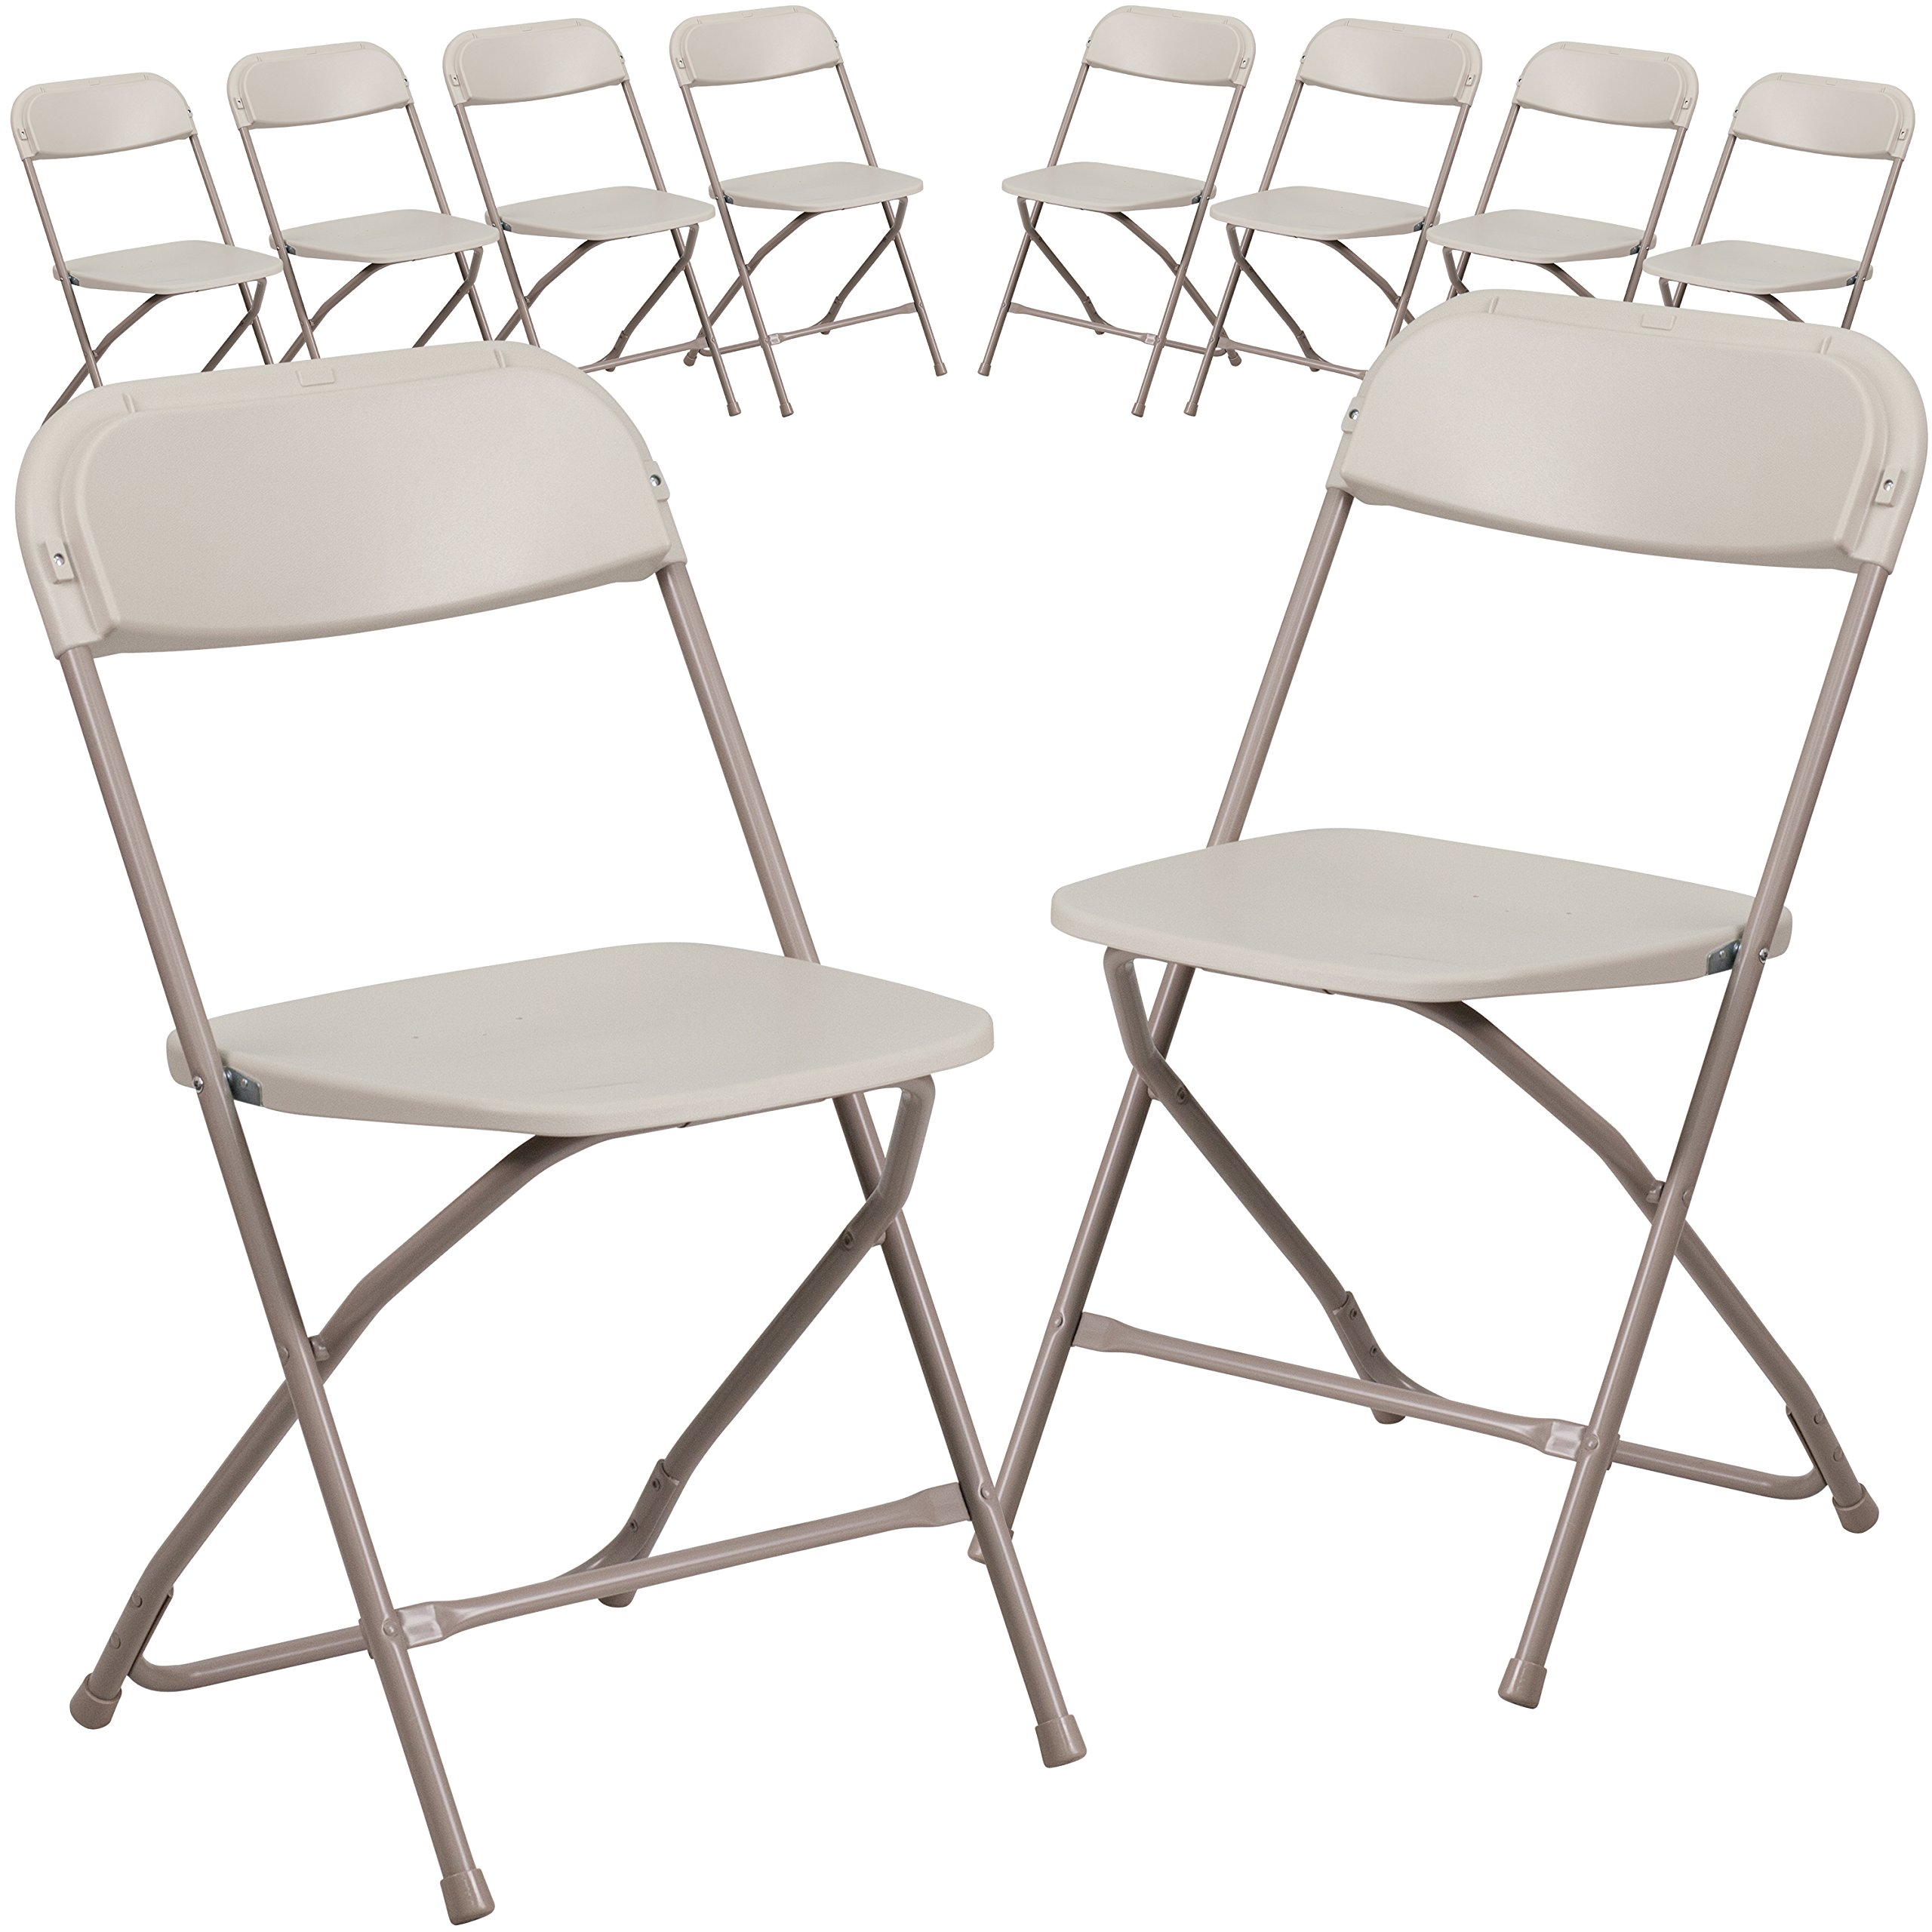 Flash Furniture 10 Pk. HERCULES Series 800 lb. Capacity Premium Beige Plastic Folding Chair by Flash Furniture